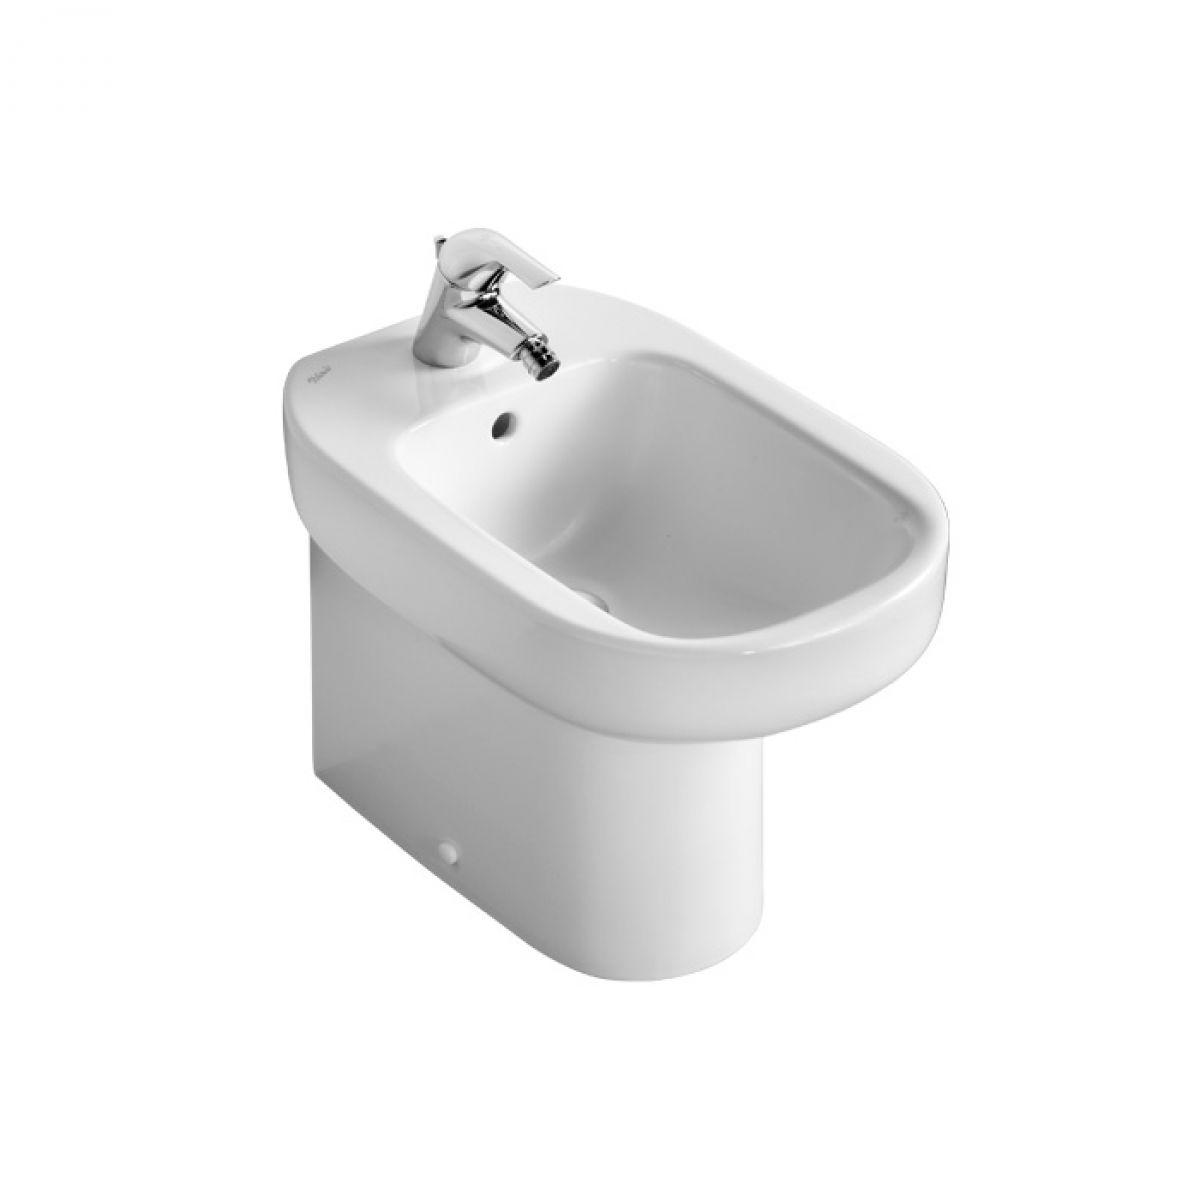 ideal standard playa floorstanding bidet uk bathrooms. Black Bedroom Furniture Sets. Home Design Ideas